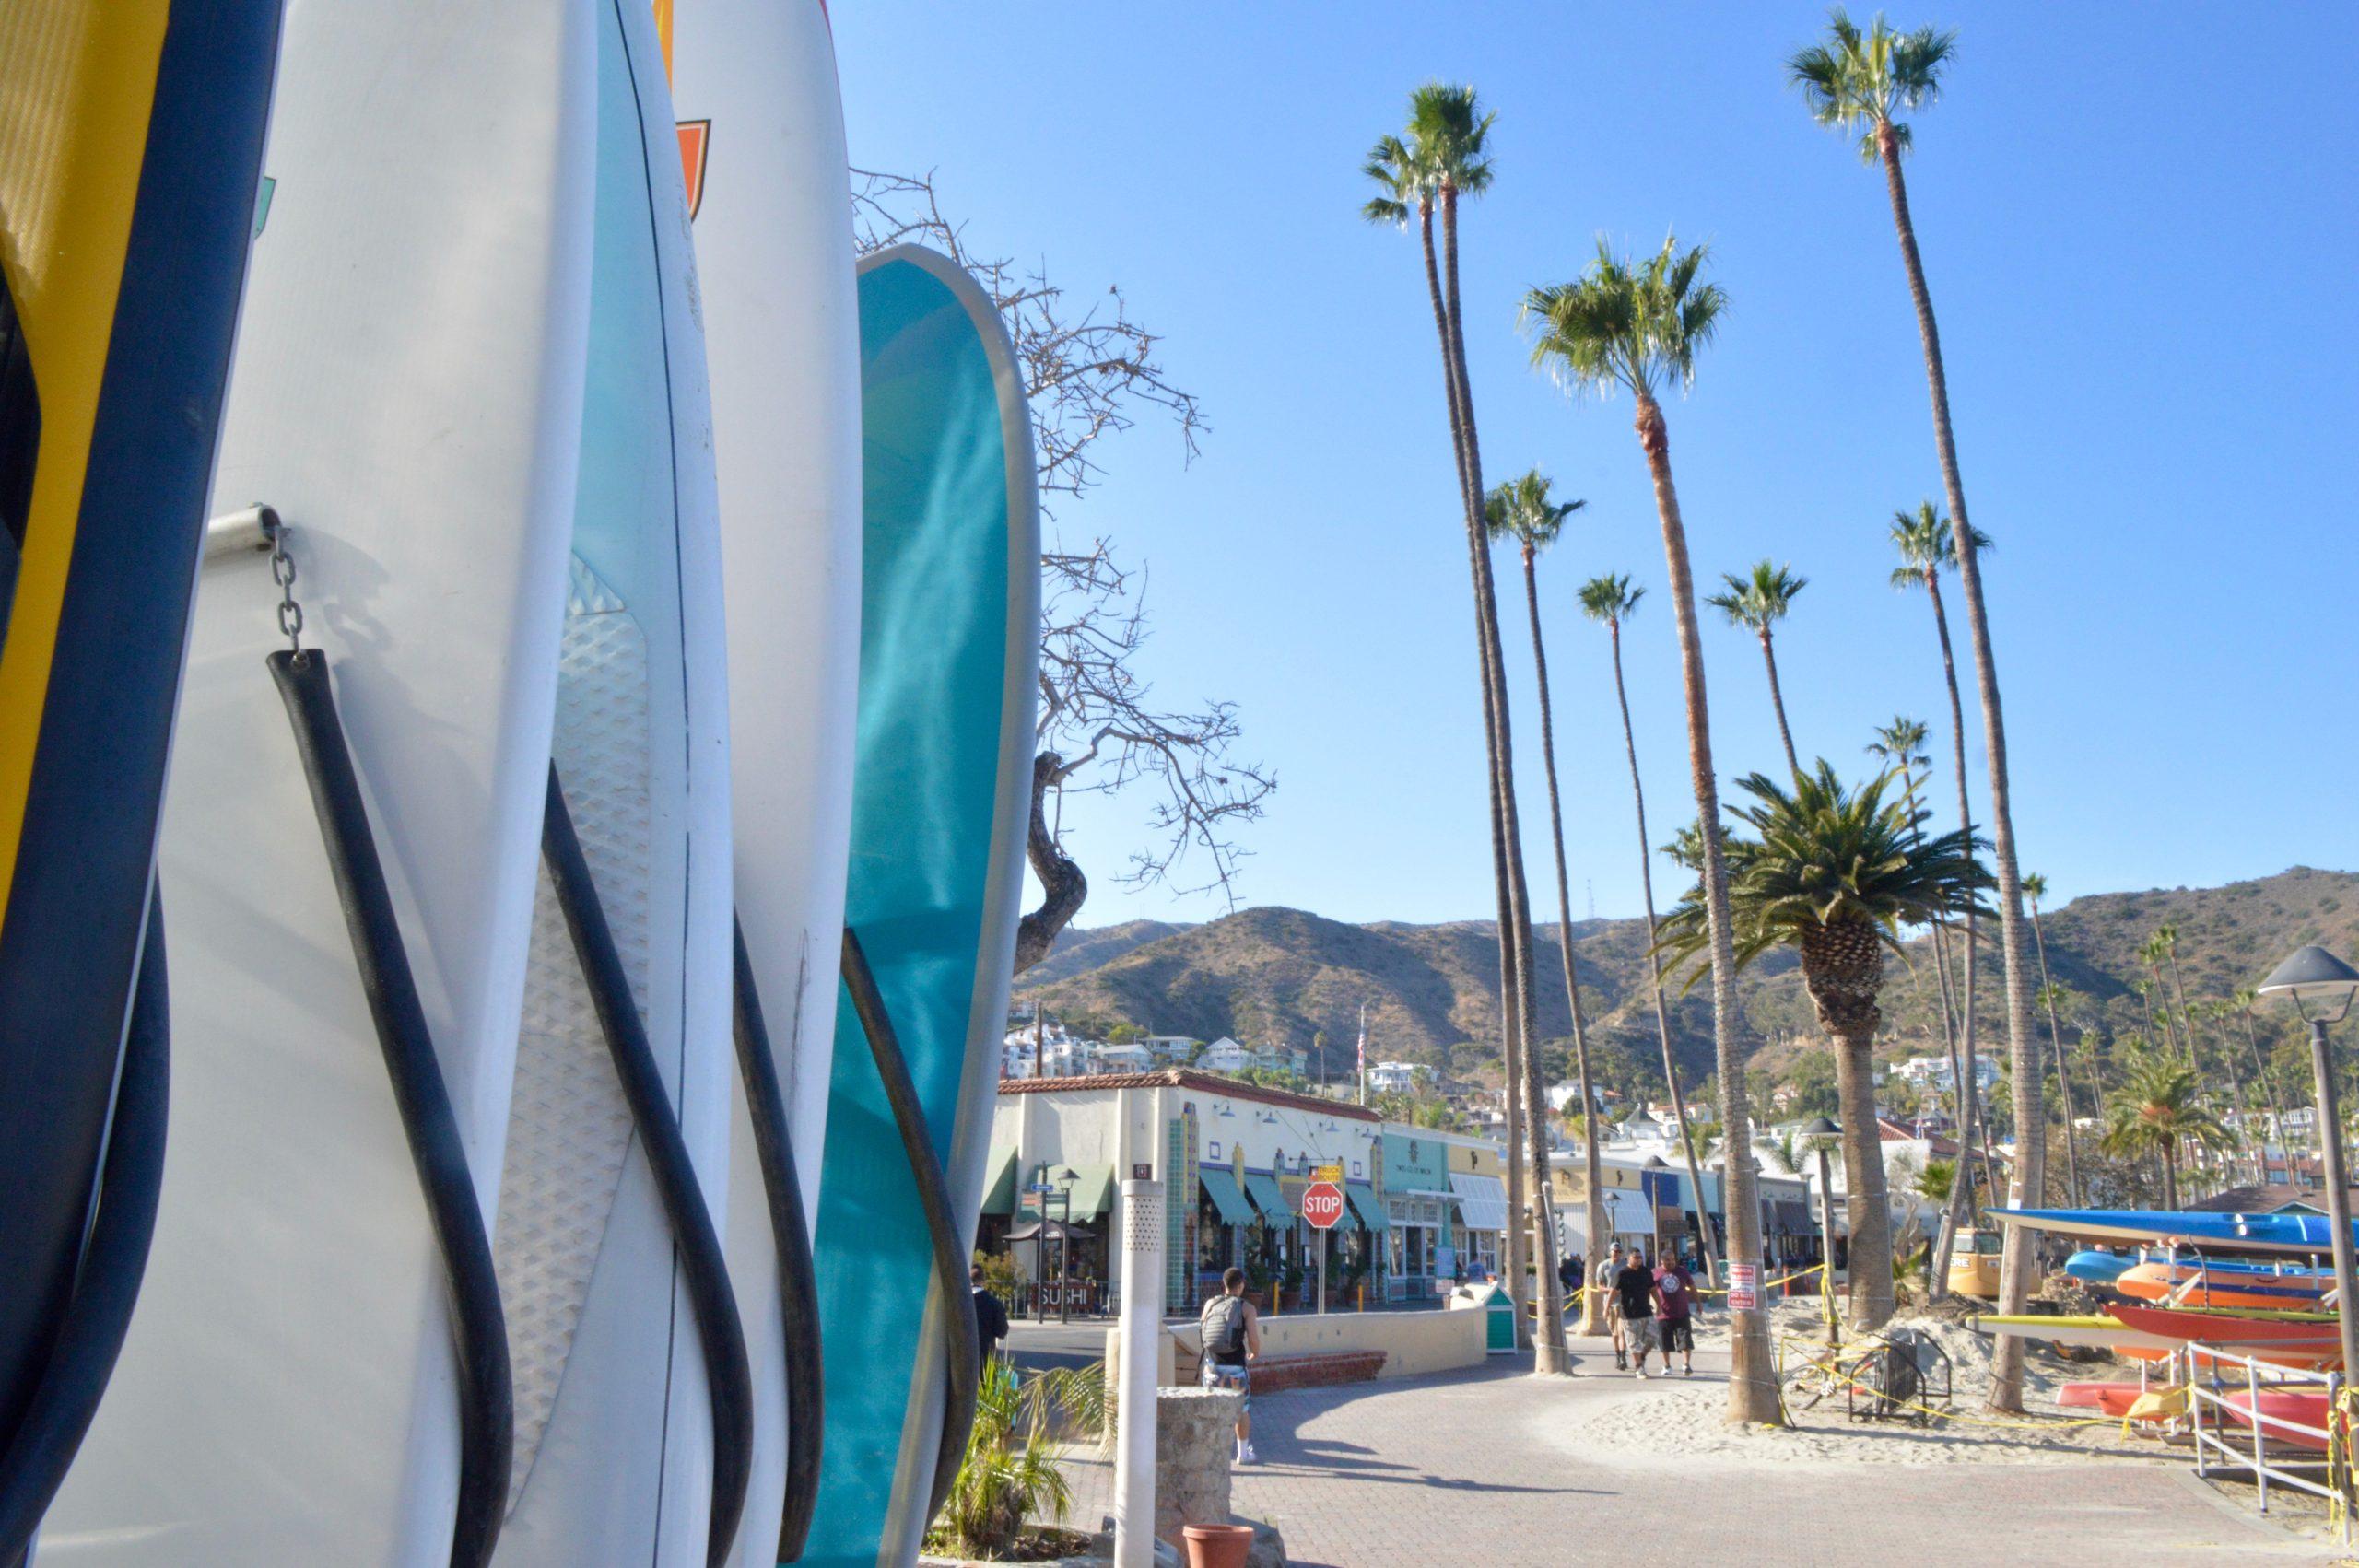 Catalina Island Avalon Paddle Board